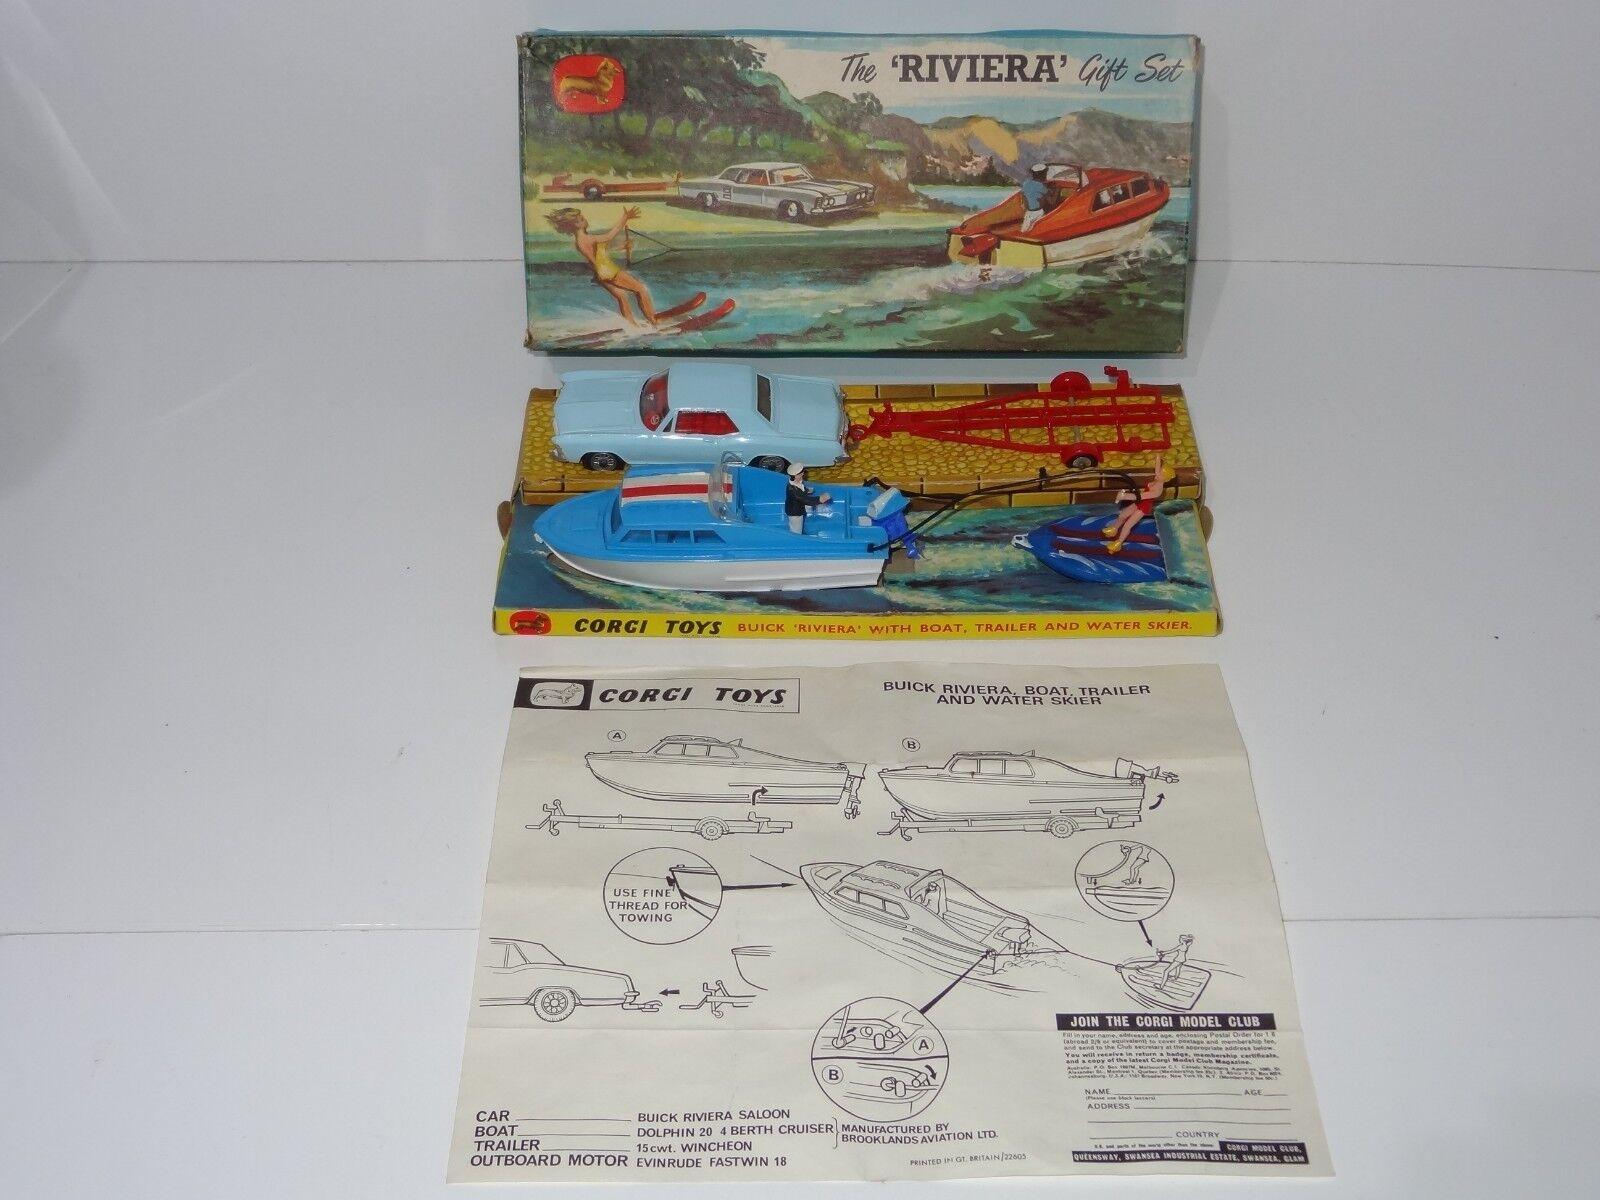 (S) Corgi THE RIVIERA RIVIERA RIVIERA GIFTSET - gift set GS 31 ea6029